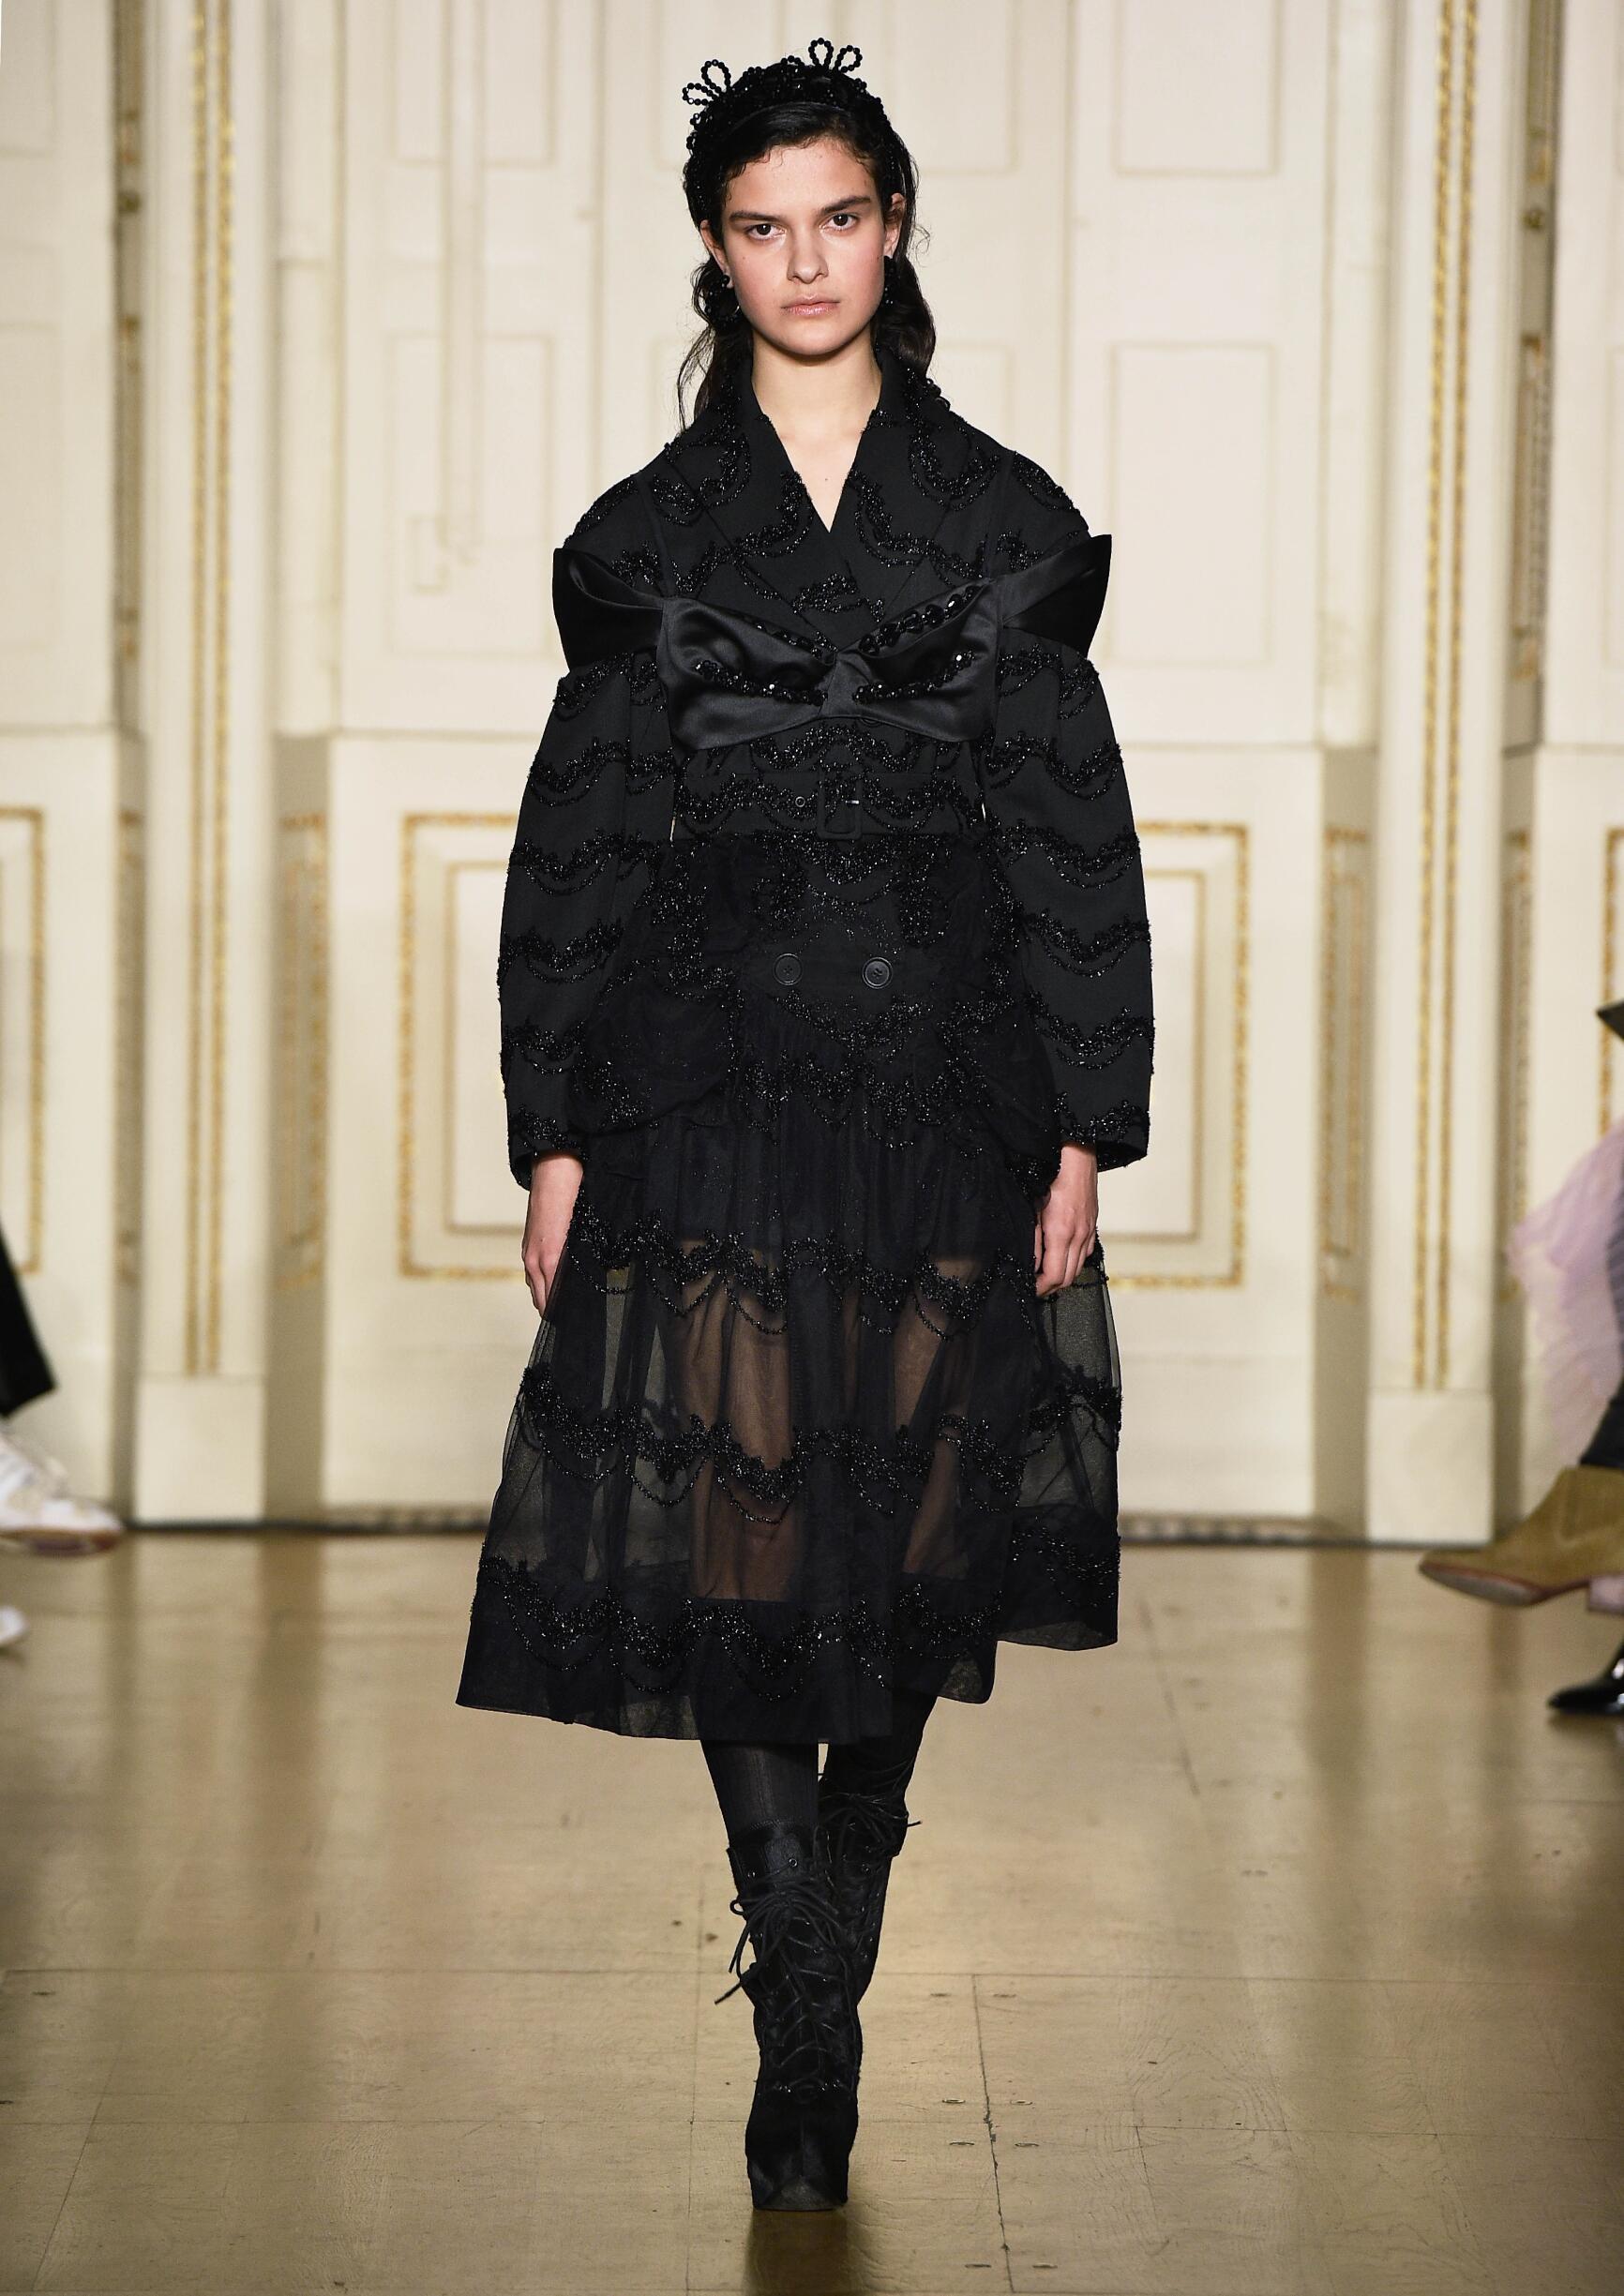 FW 2019-20 Simone Rocha Fashion Show